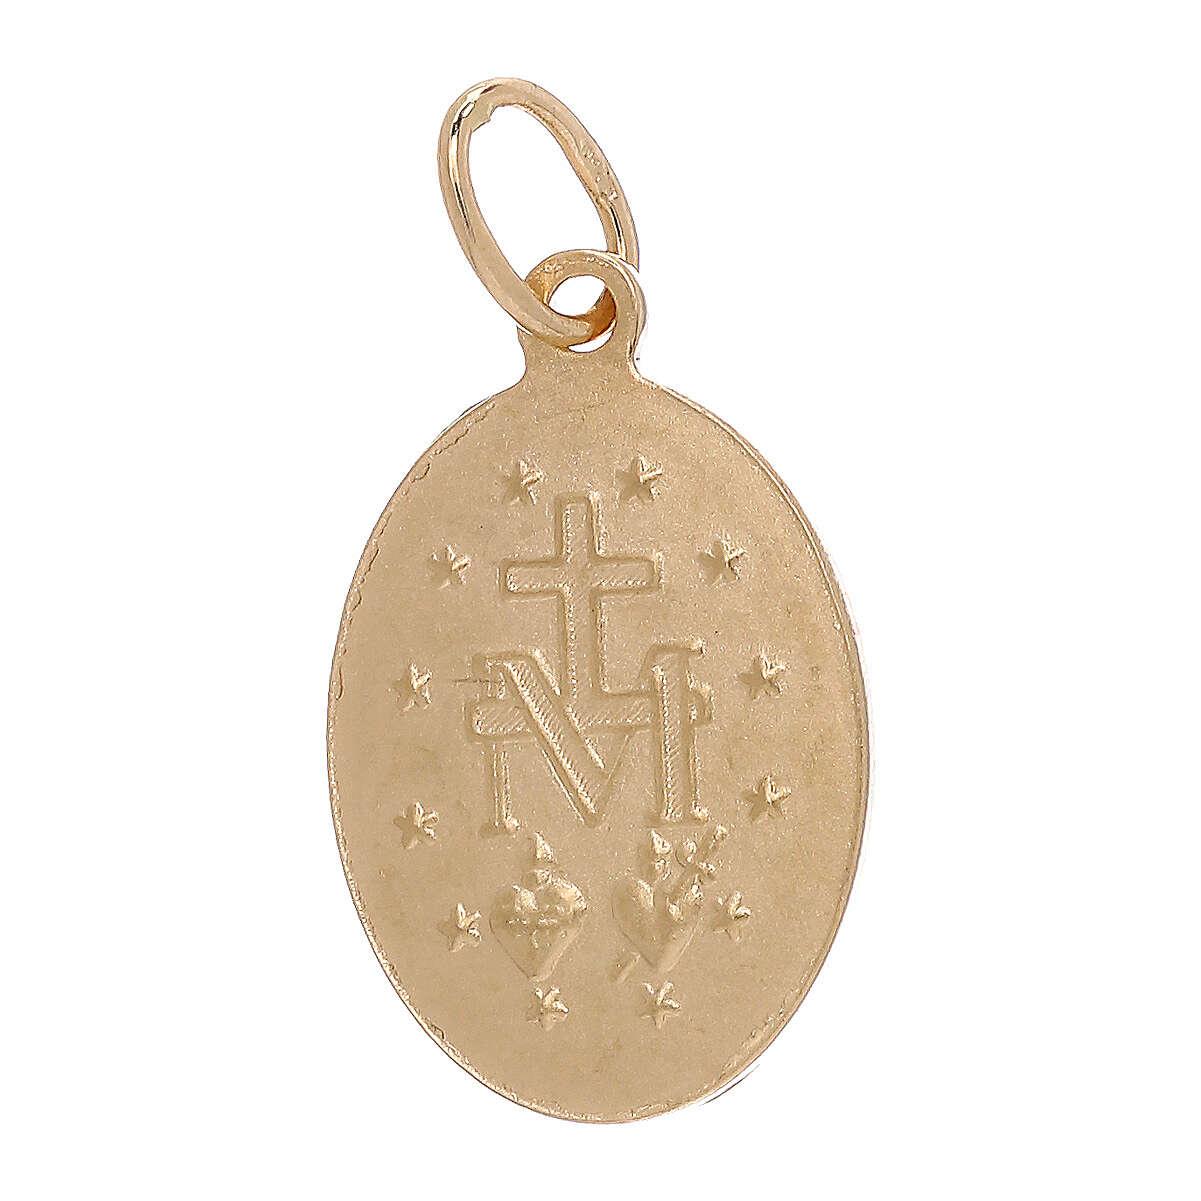 Pendentif Médaille Miraculeuse or jaune 18K 1,8 gr 4